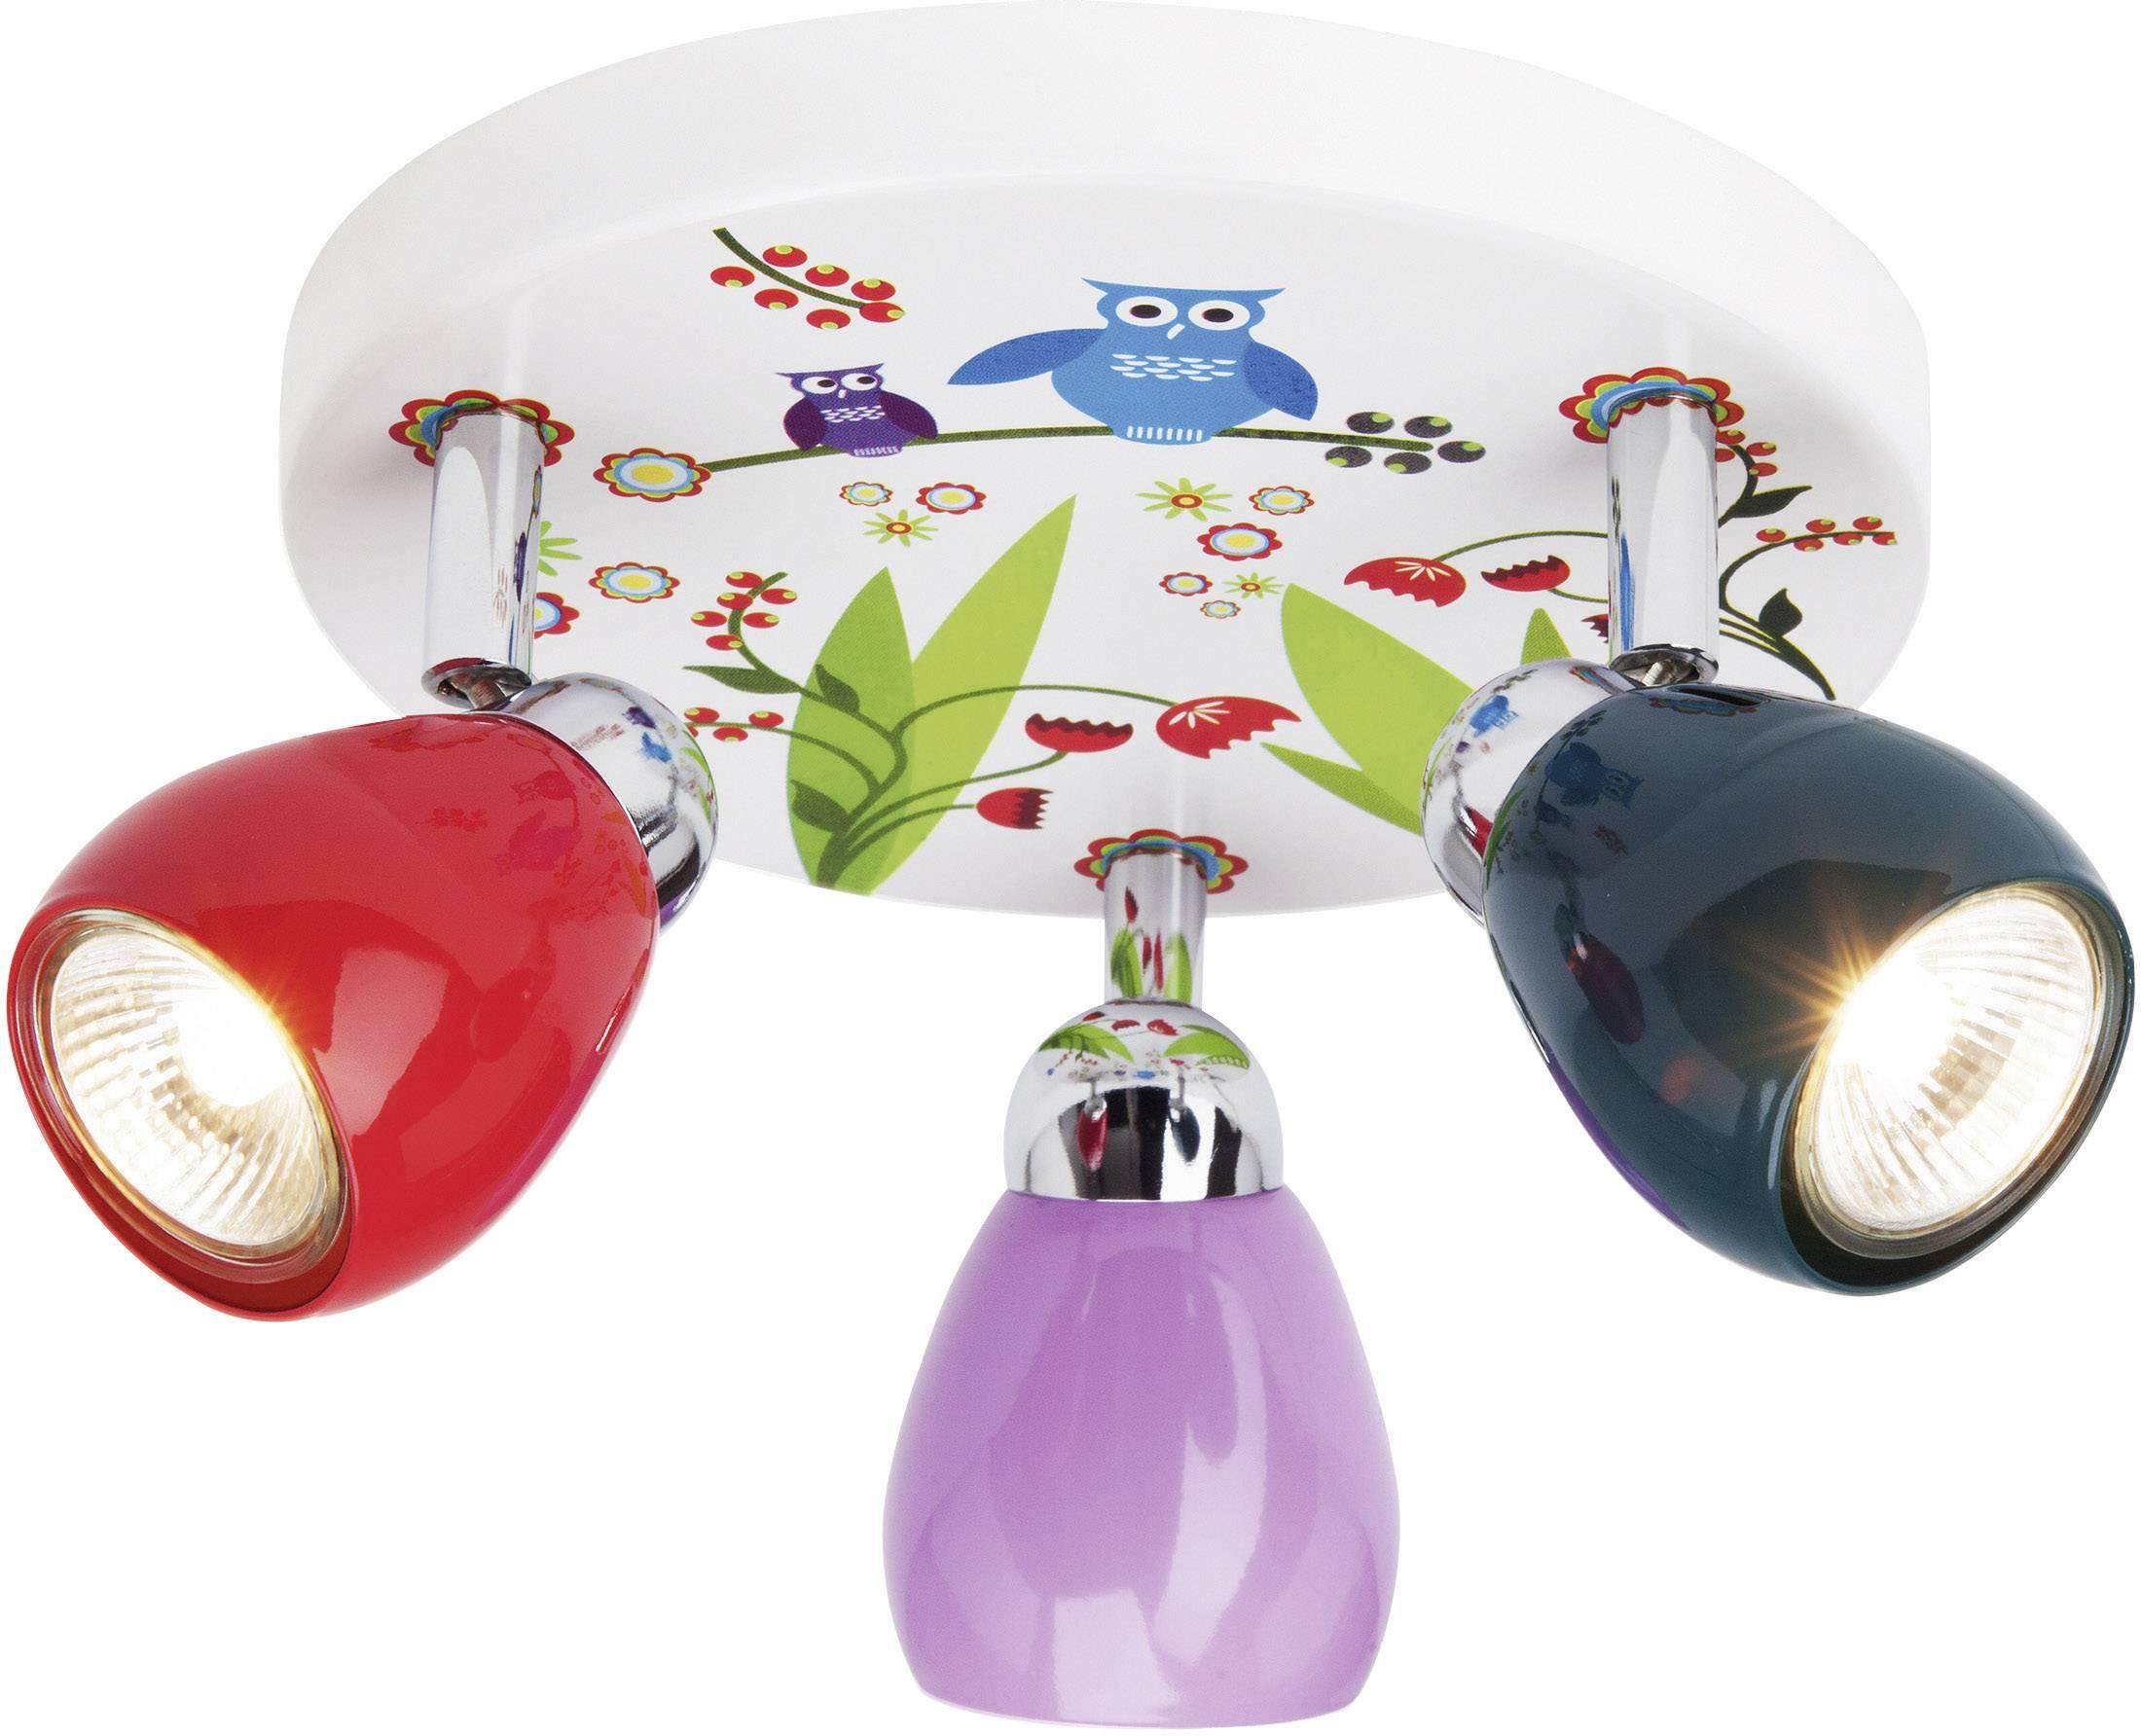 Briljant Lampje Kinderkamer : Plafondlamp uil halogeen gu10 bont brilliant ptice conrad.nl